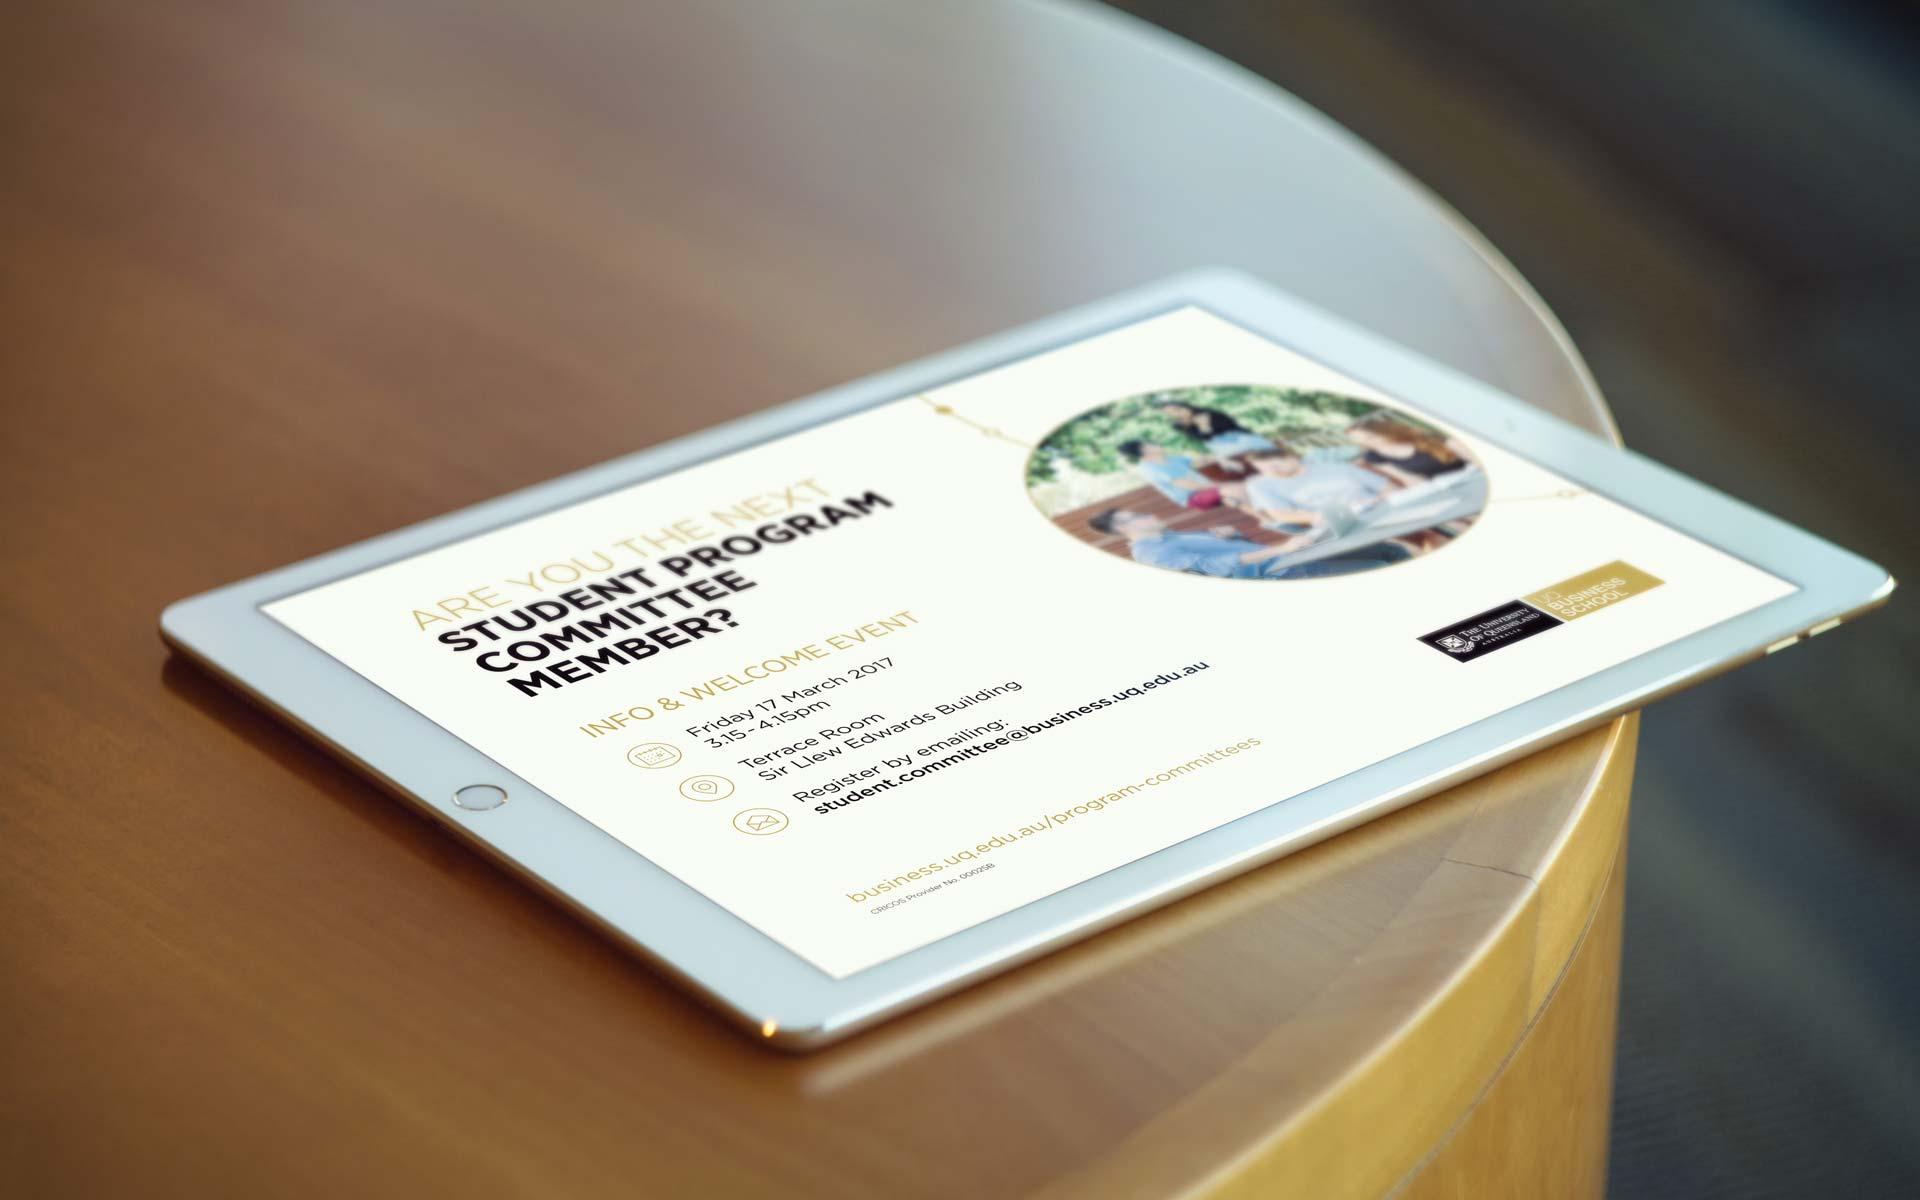 UQ Infographic Design Student Program Event Design